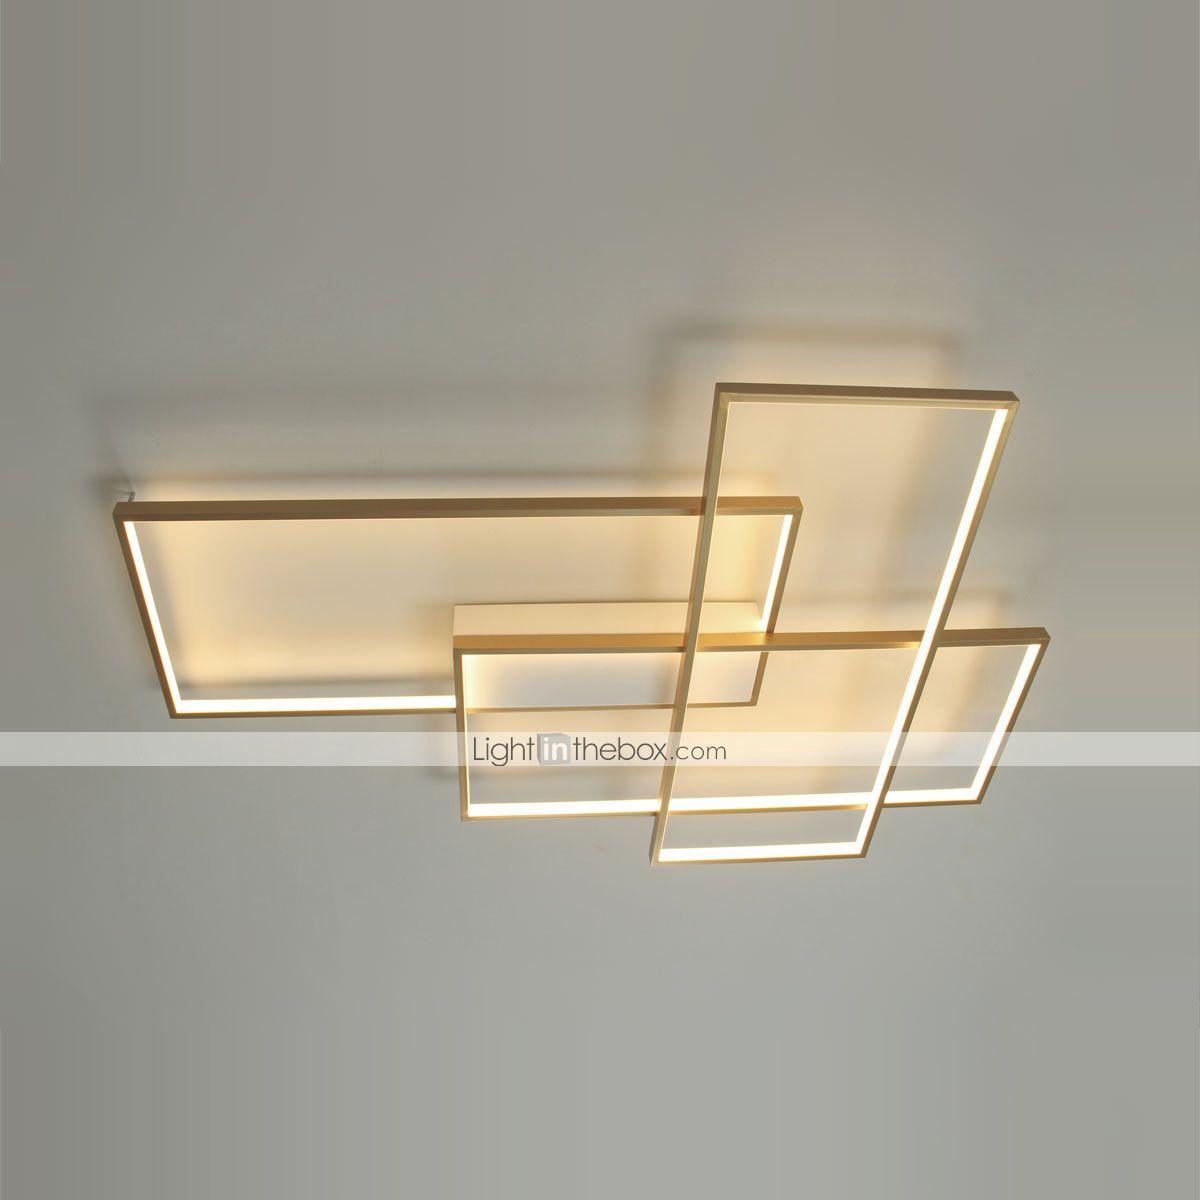 Lights & Lighting Round White Black Frame Modern Led Ceiling Light Ac85~265v Indoor Bedroom Kitchen Lamps Study Foyer Light Free Shipping Dimmable